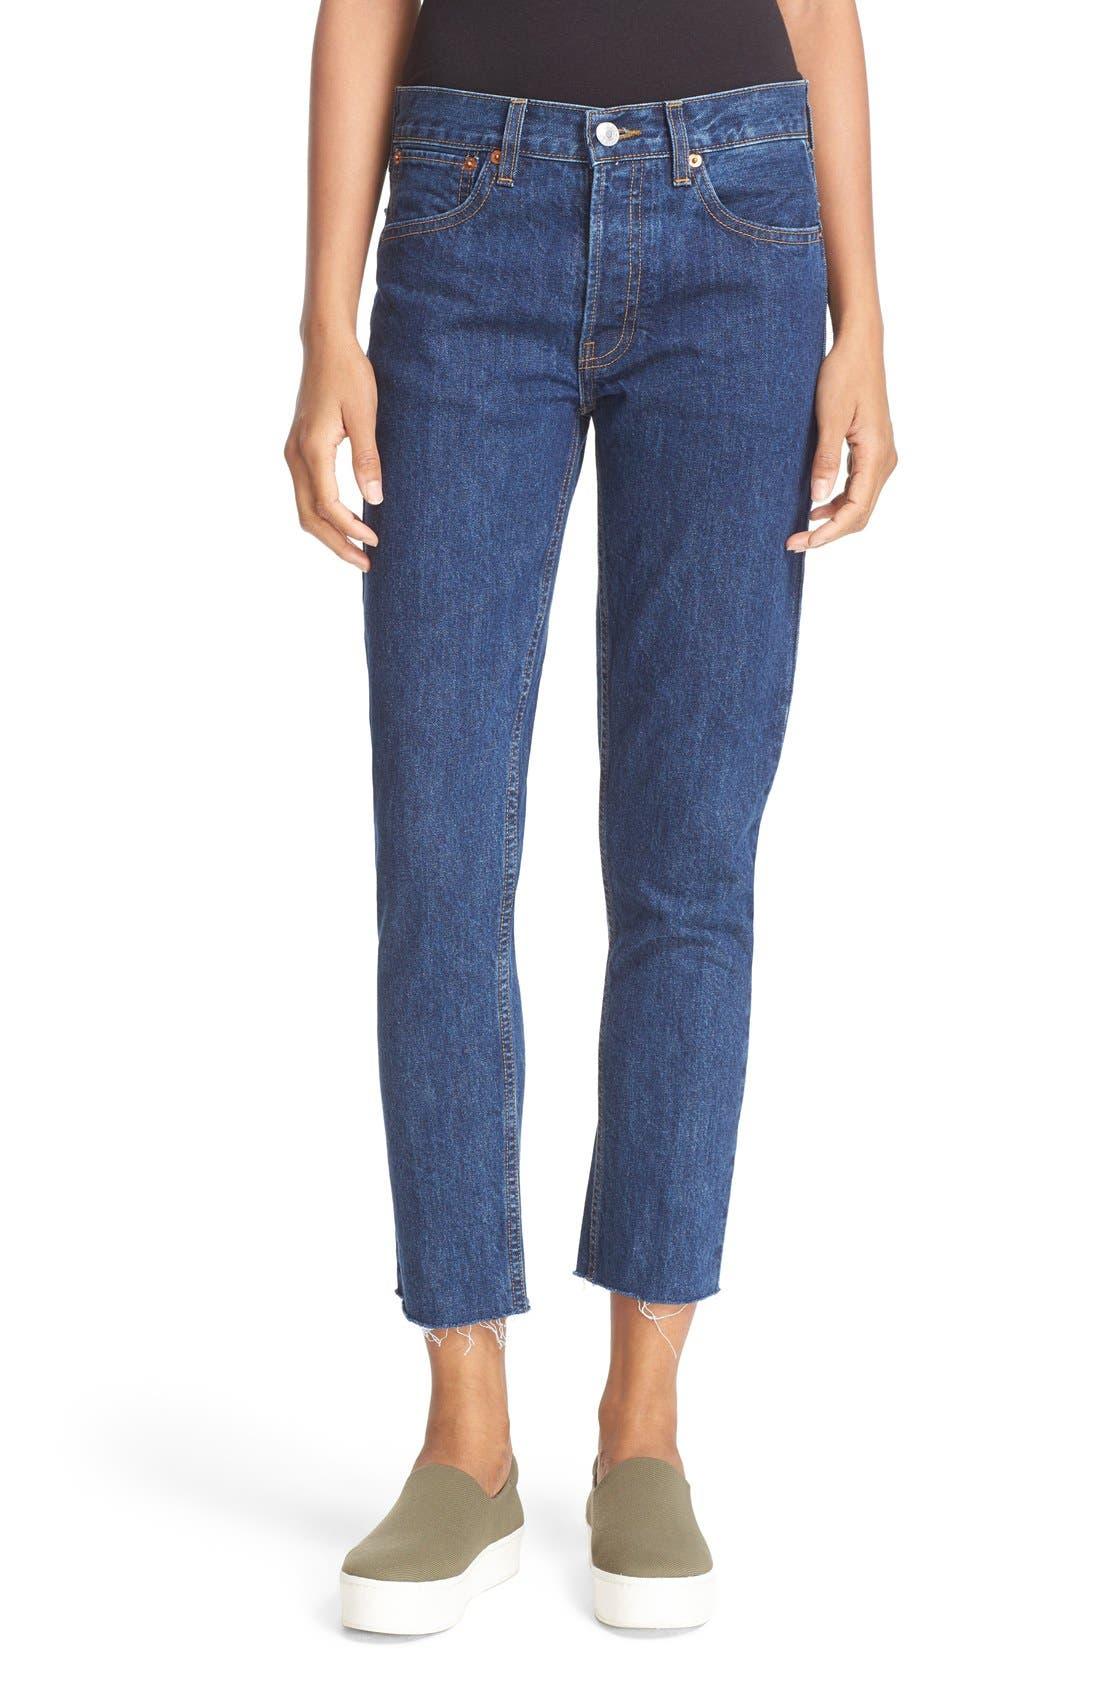 Originals High Waist Crop Jeans,                             Alternate thumbnail 6, color,                             400